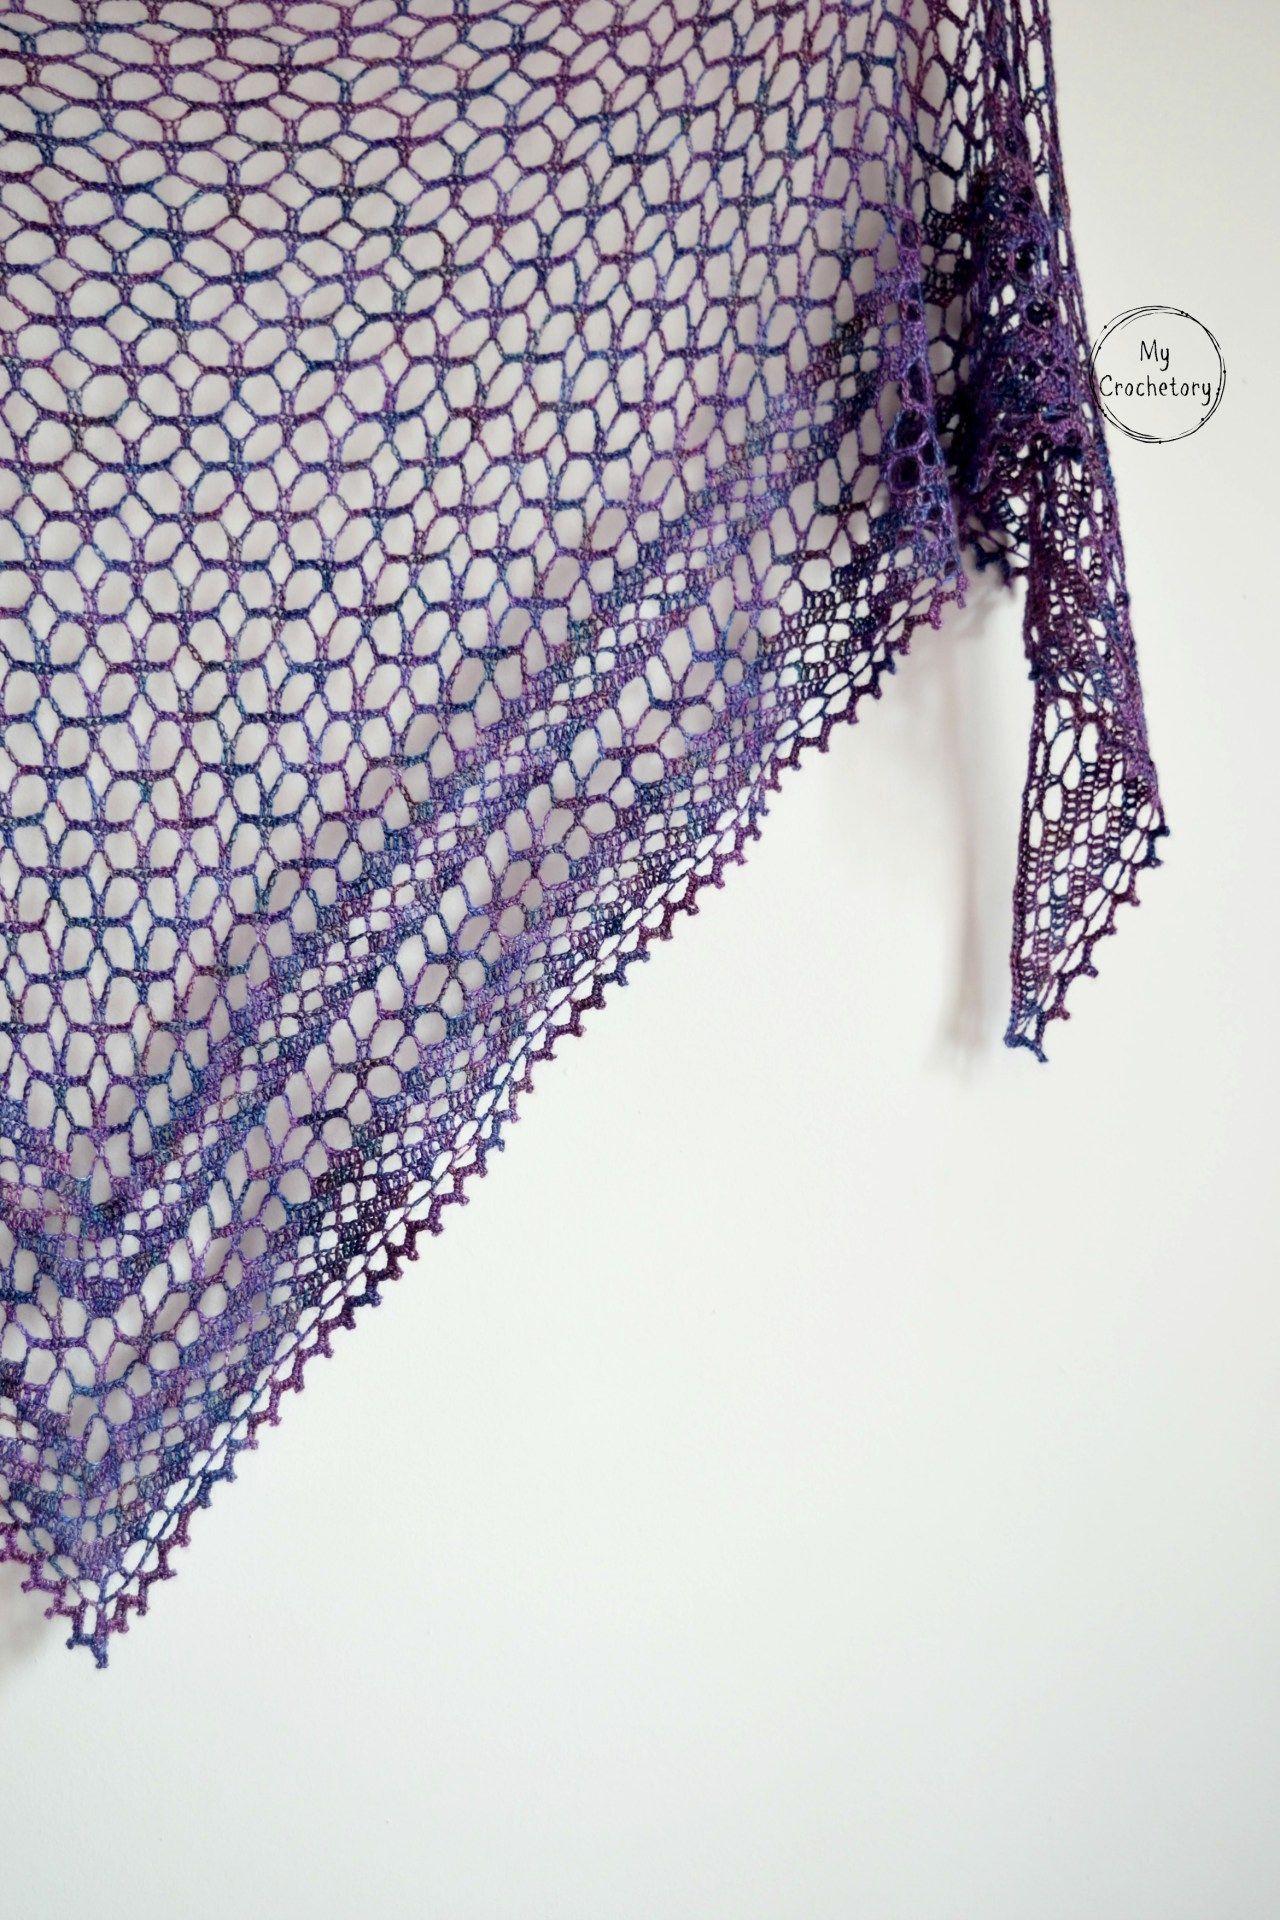 Crochet Nightfall Shawl - free crochet pattern by | Chal,shawl ...